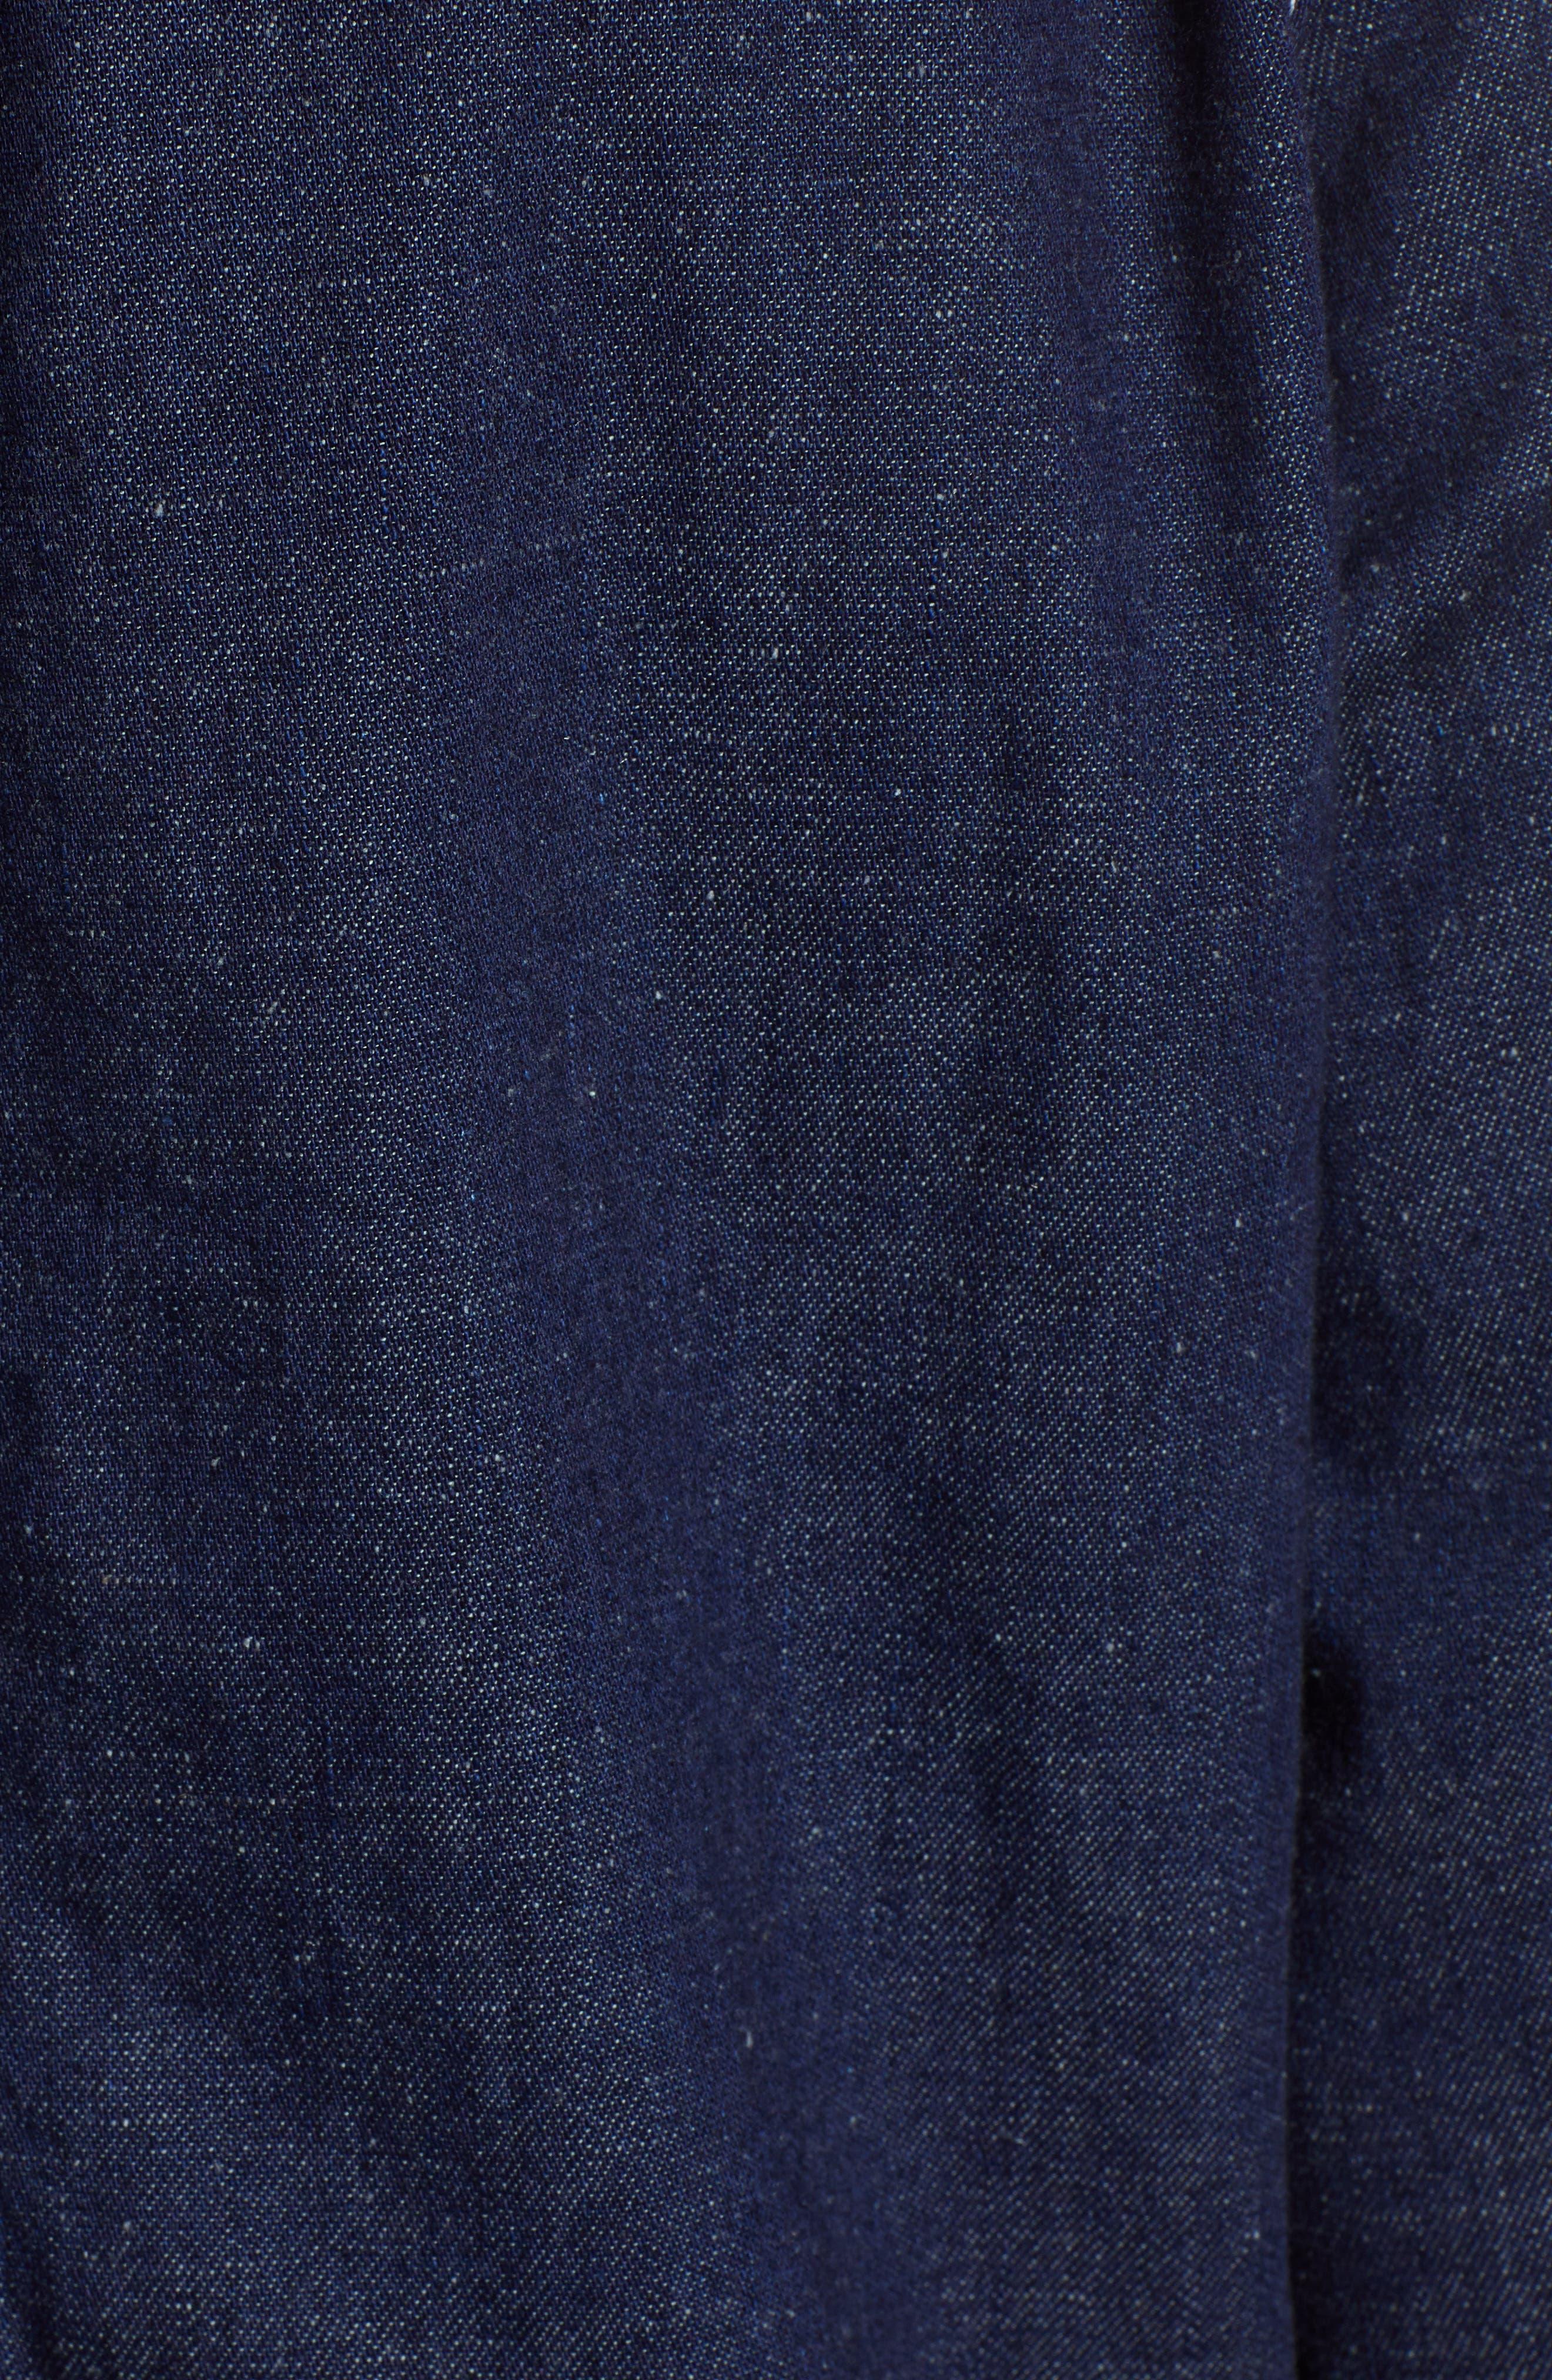 Avenall Jacket,                             Alternate thumbnail 6, color,                             Midnight Surge Mts